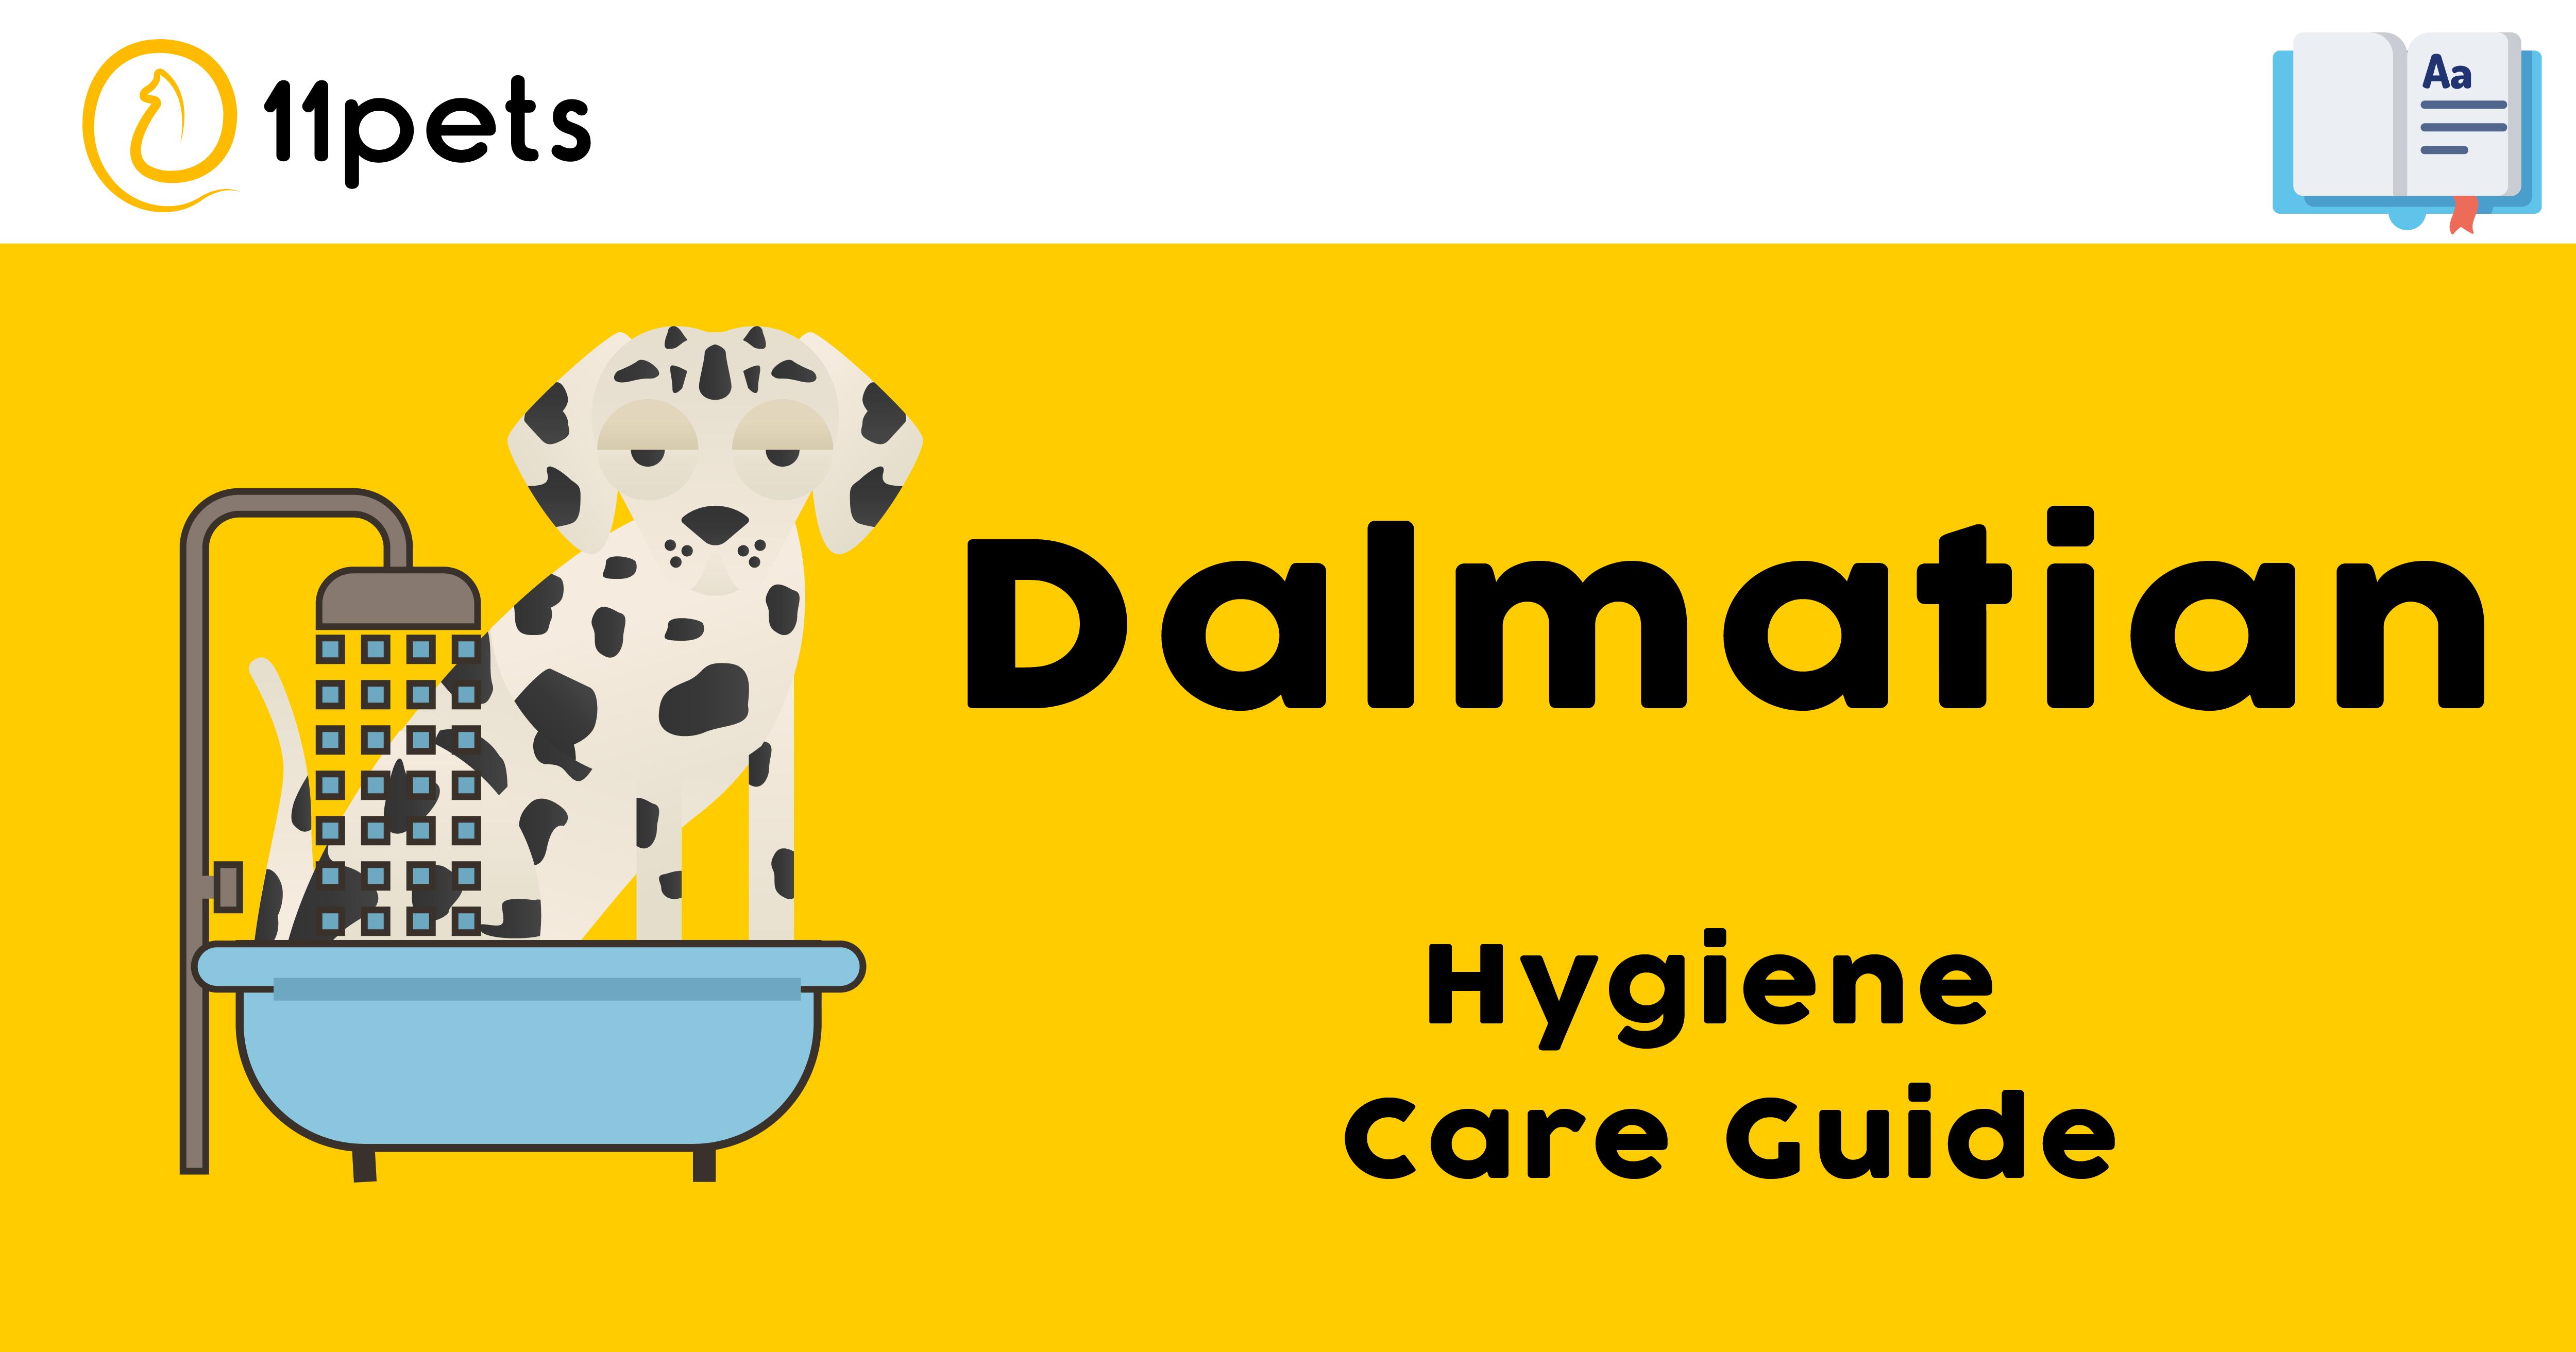 Hygiene Care Guide for Dalmatian